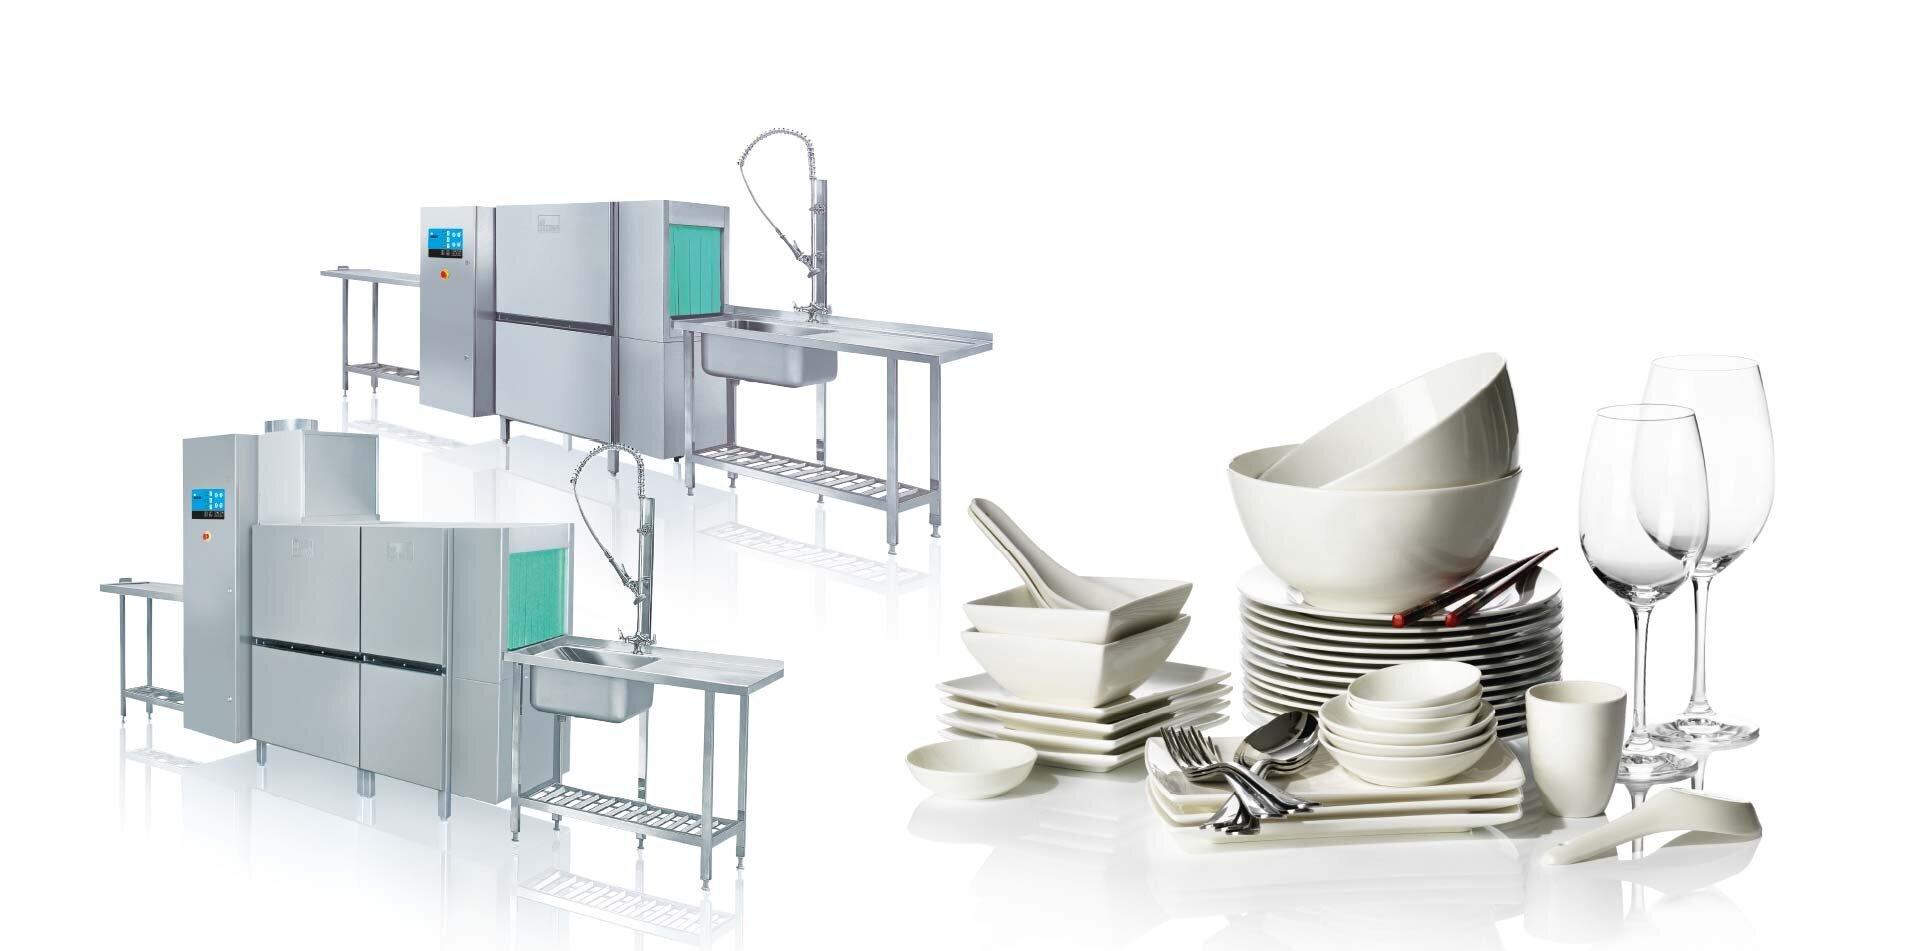 Commercial dishwashing machine K 200 M / K 260 M